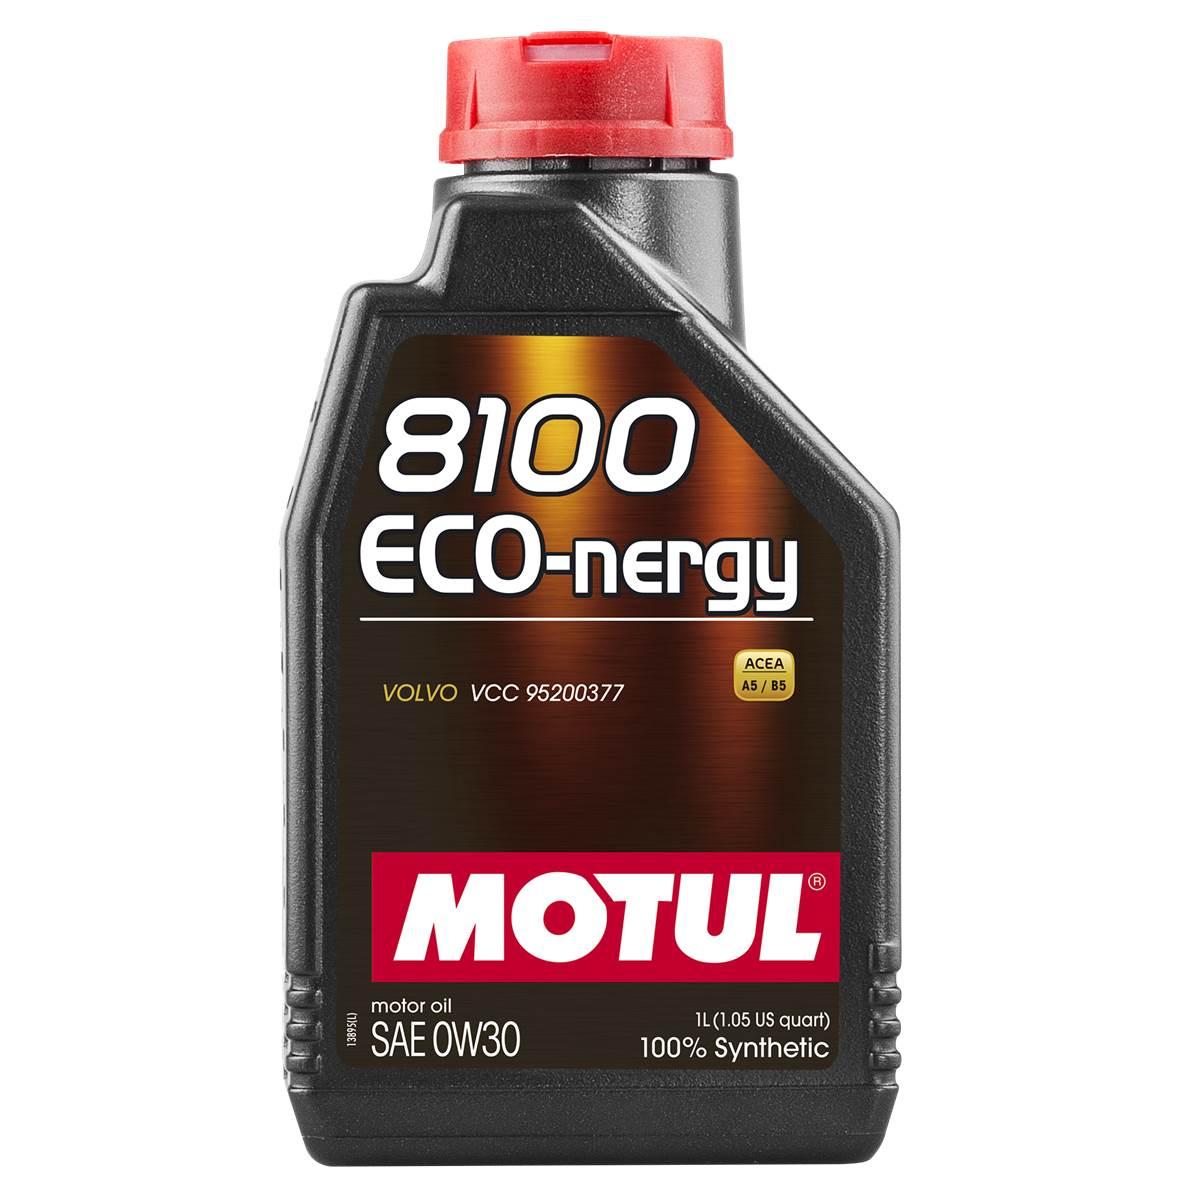 Huile moteur MOTUL 8100 Eco-Nergy 0W30 1L